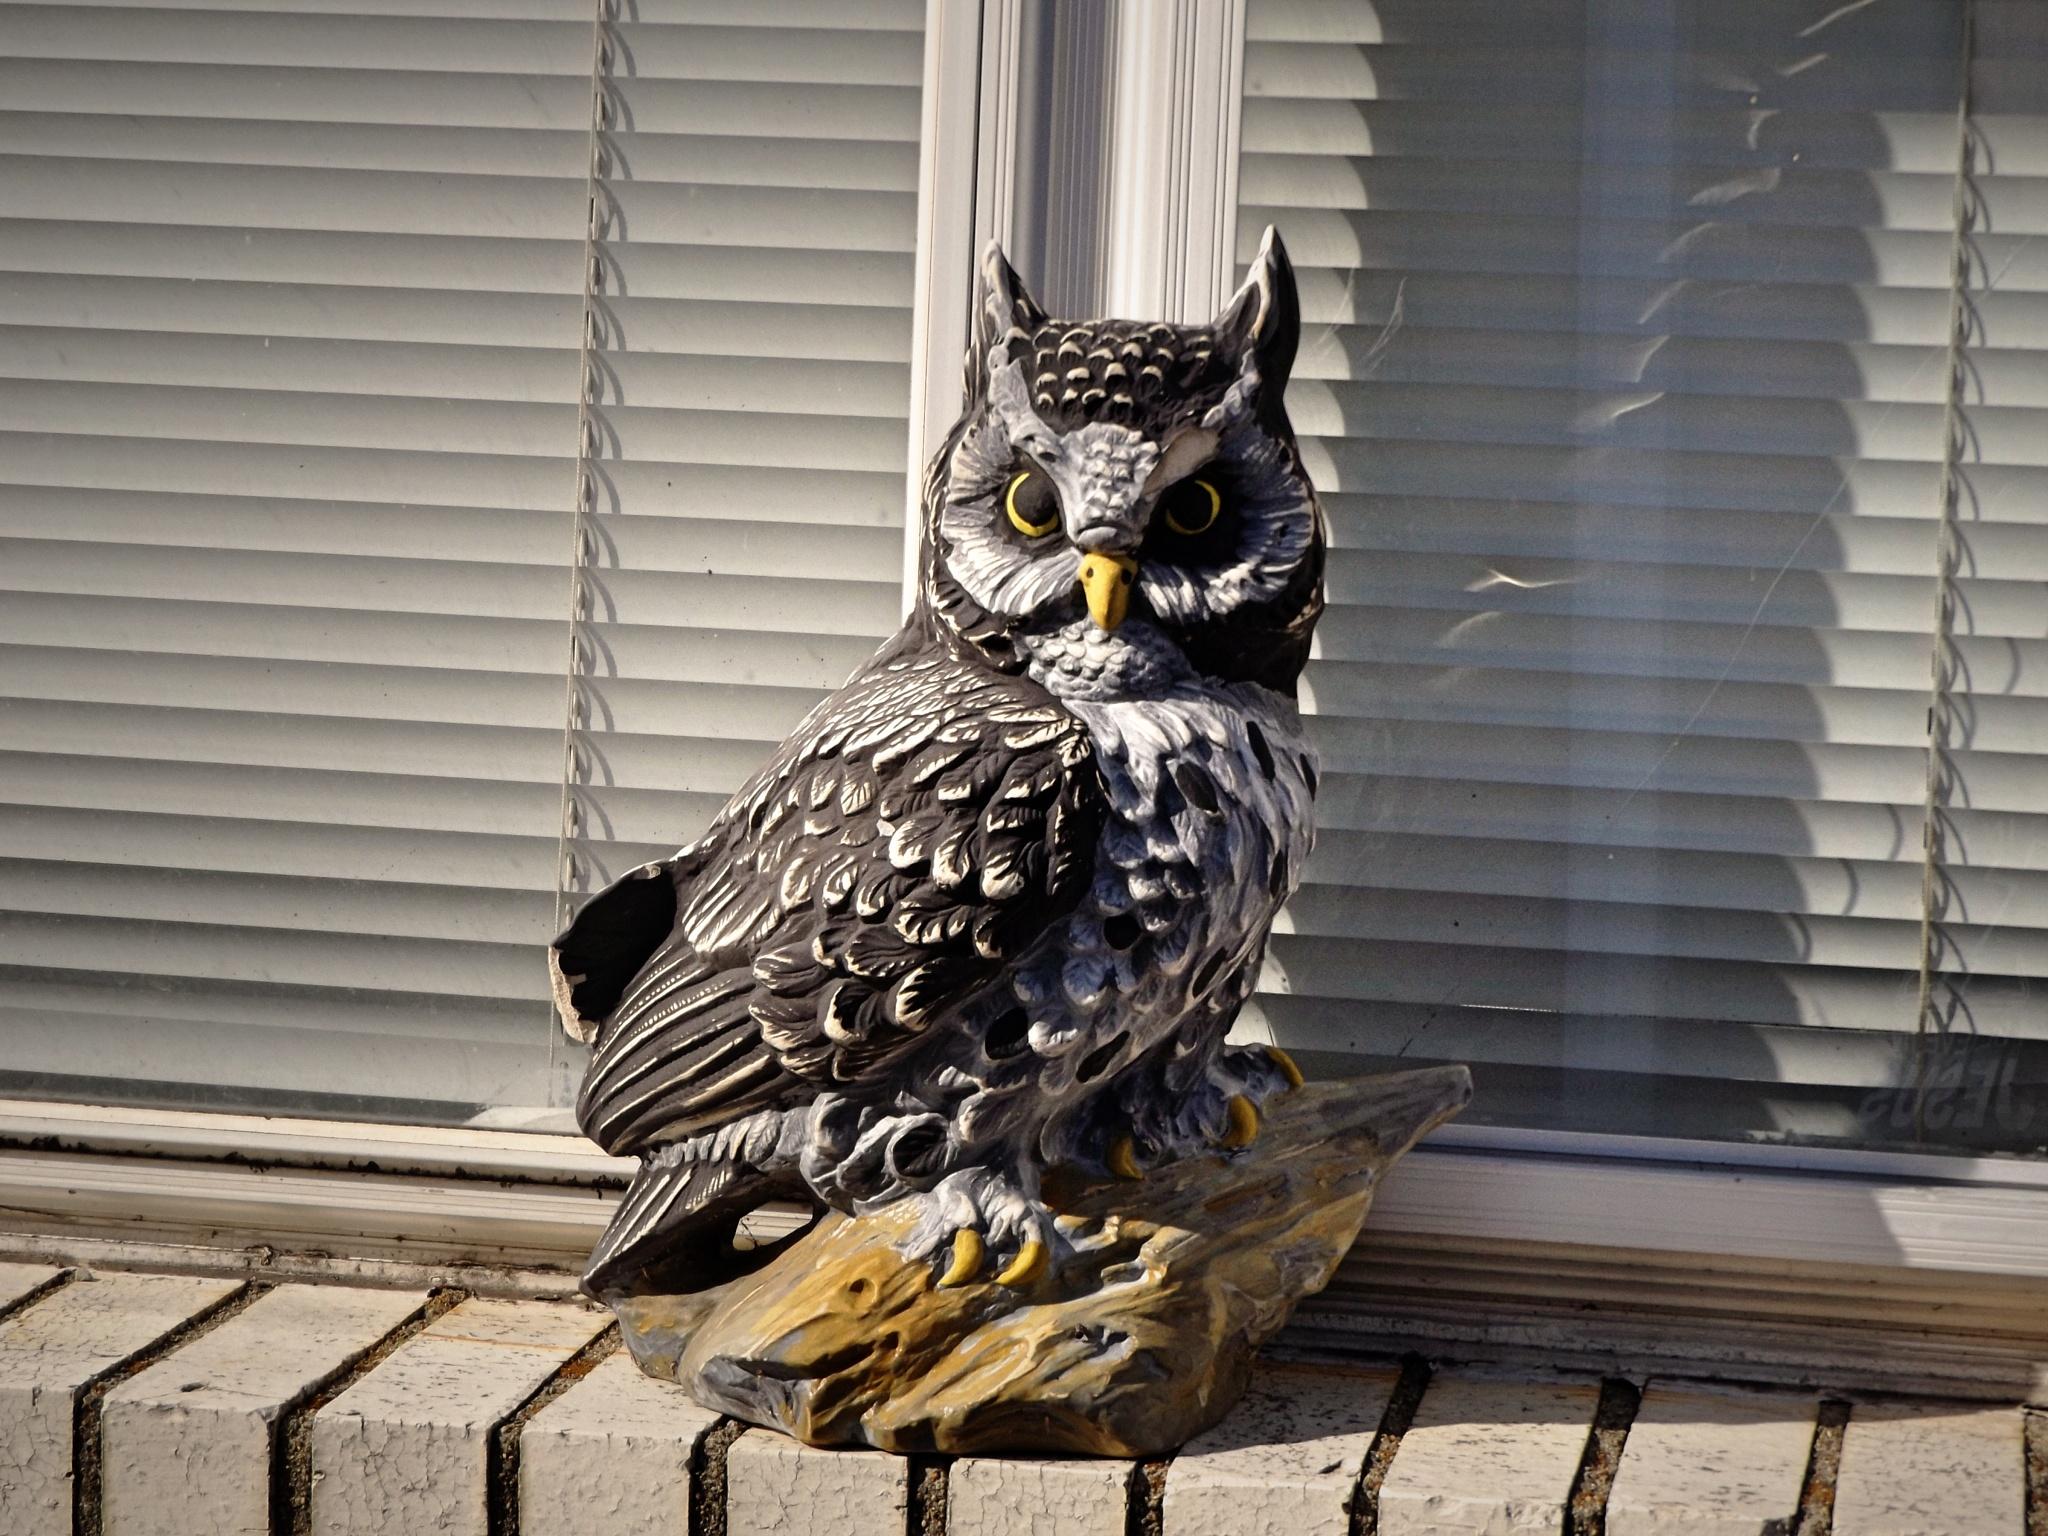 The plastic owl by Tammy Warner Hood